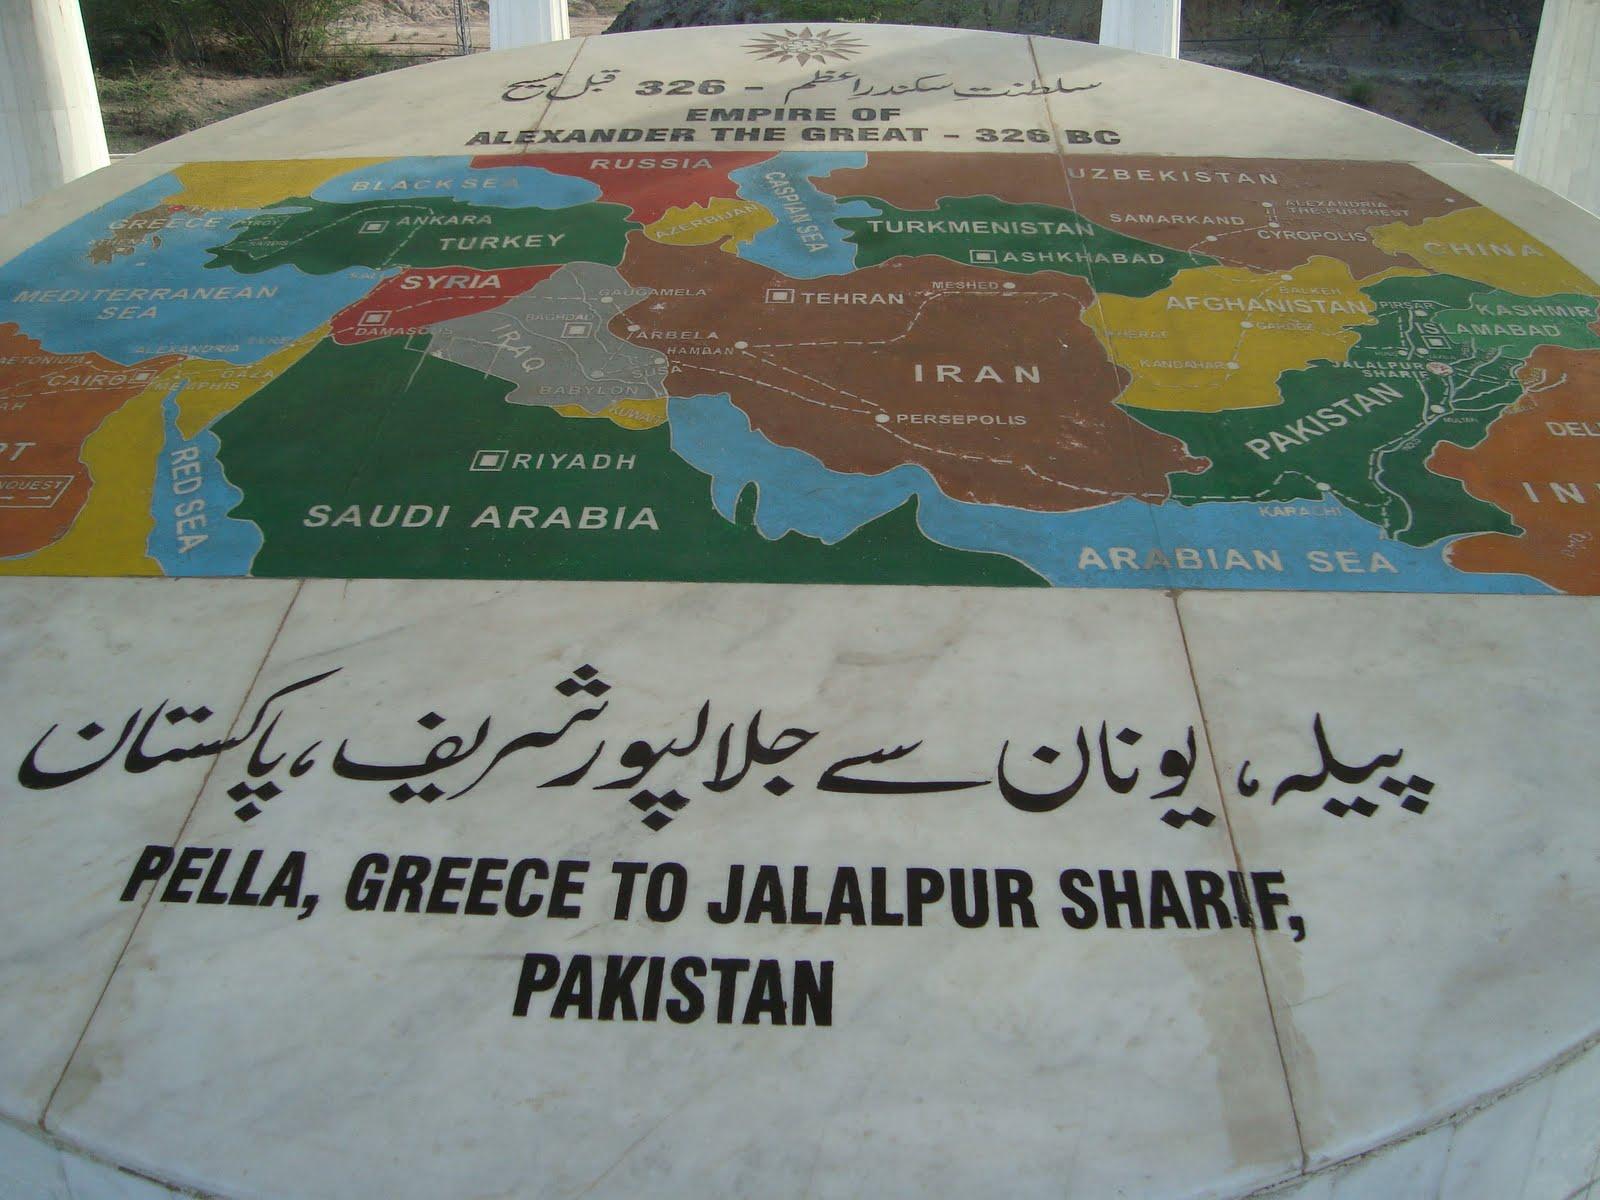 Pella Greece Map.Alexander S March Pella Greece To Jalalpur Sharif Pakistan Jaho